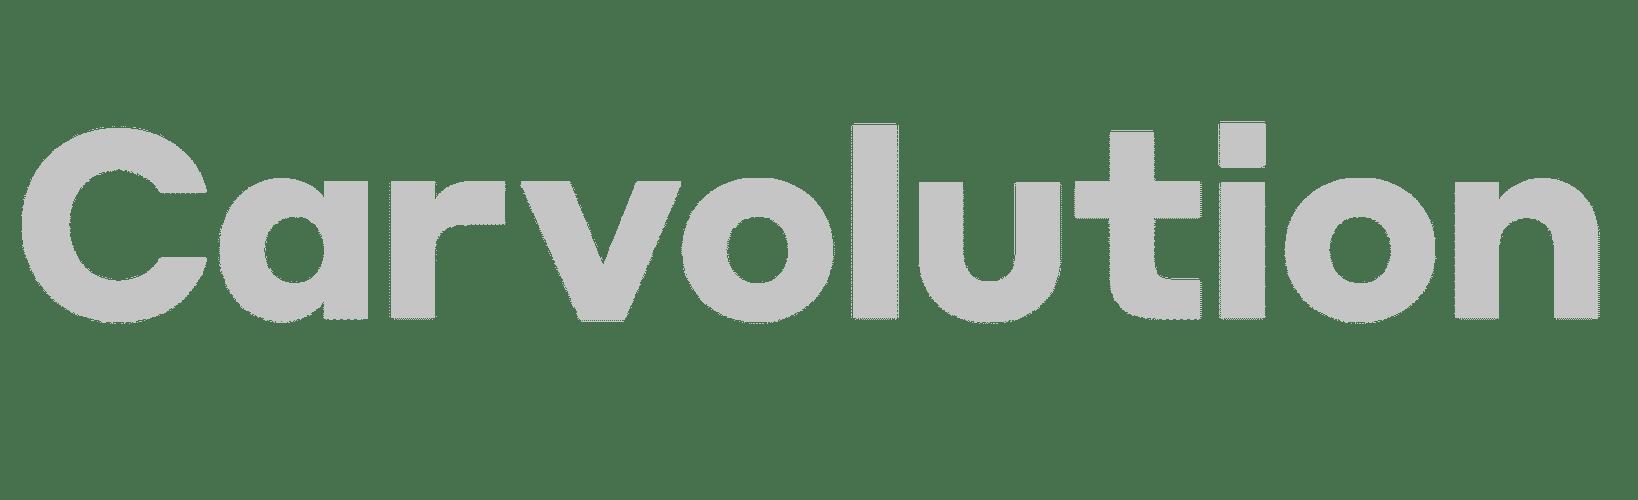 carvolution logo grey scale